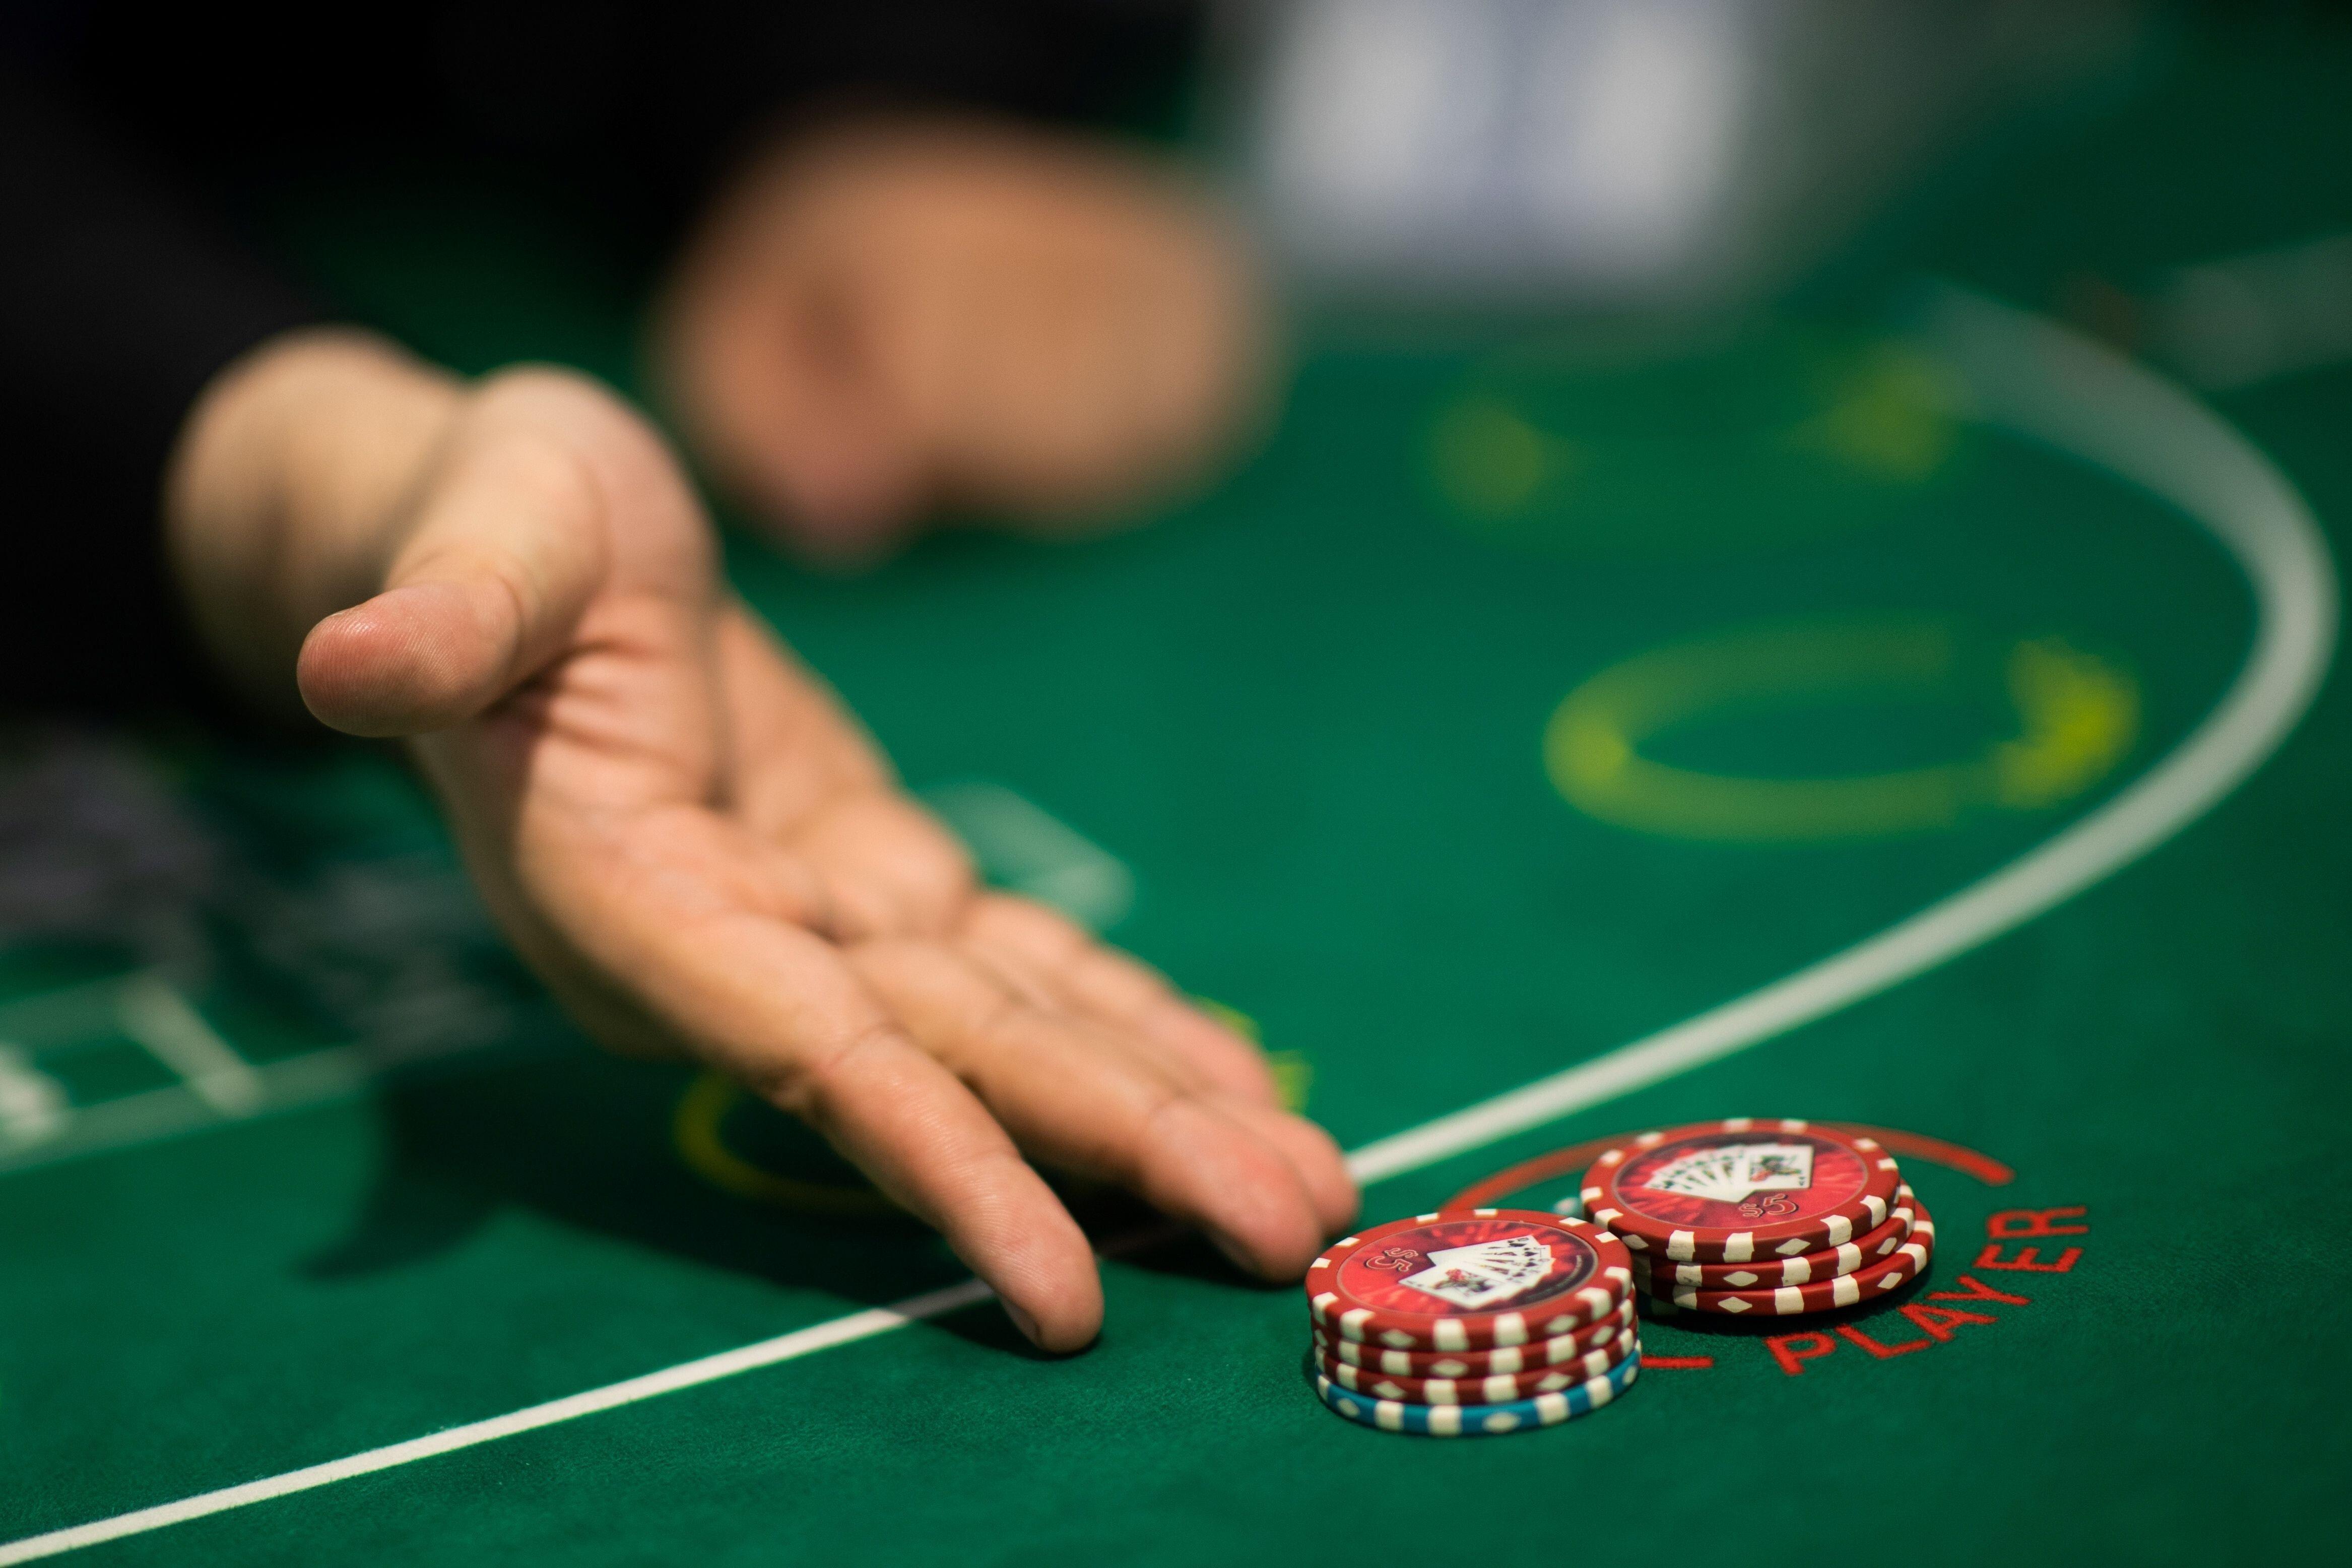 More illegal gambling in Hong Kong as people stuck at home during  coronavirus pandemic bet on winning easy money   South China Morning Post